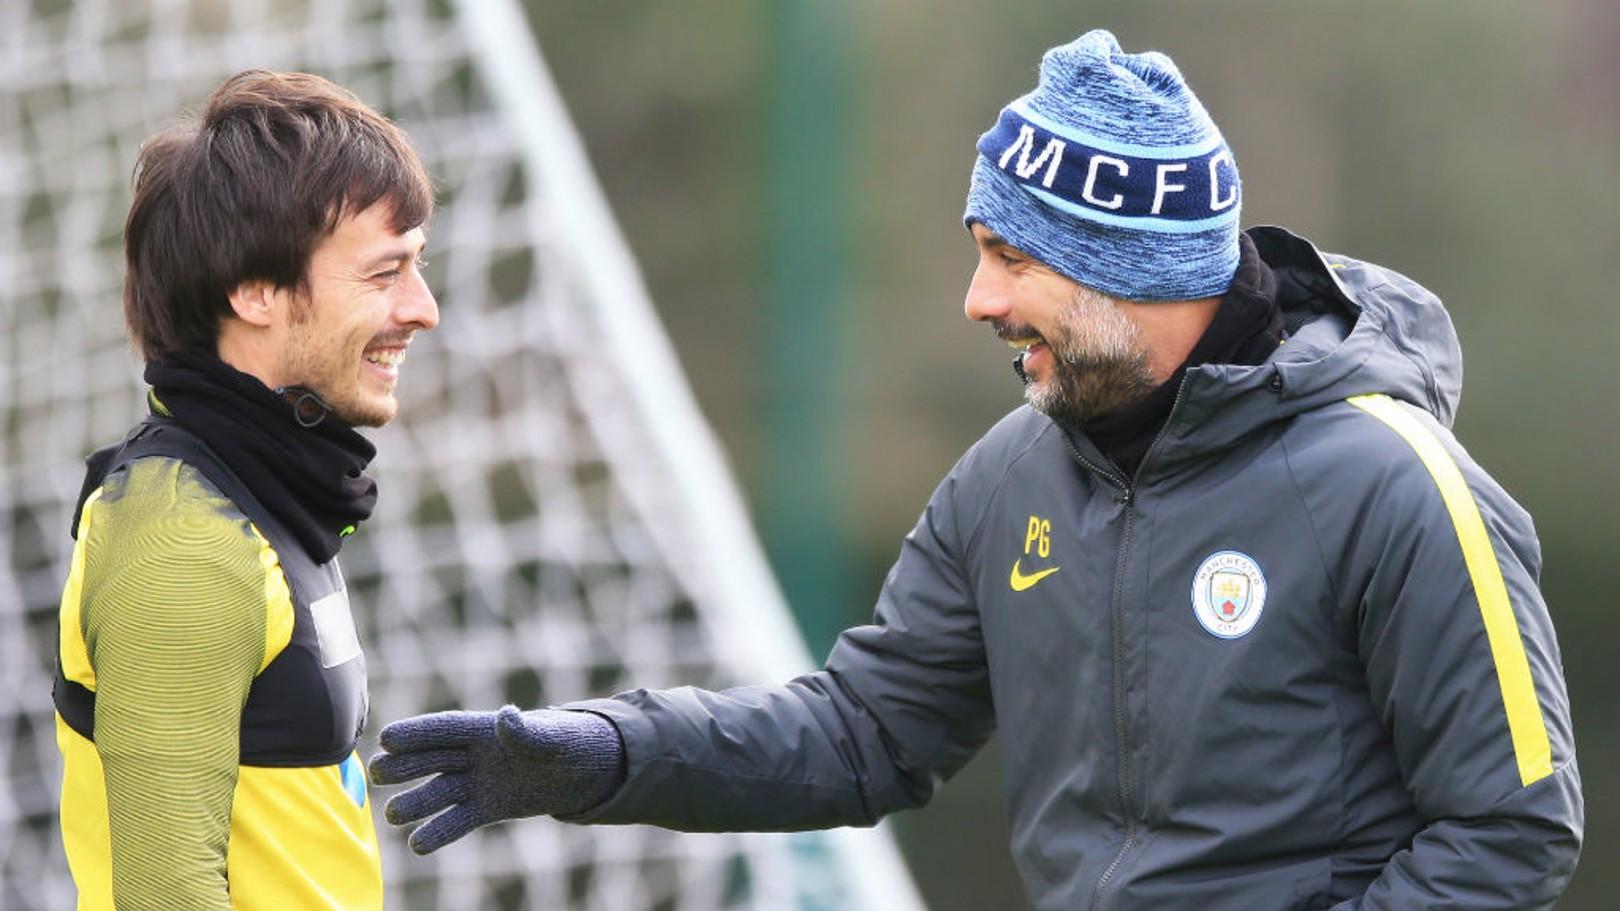 SPANIARDS: David Silva and Pep Guardiola share a moment during training